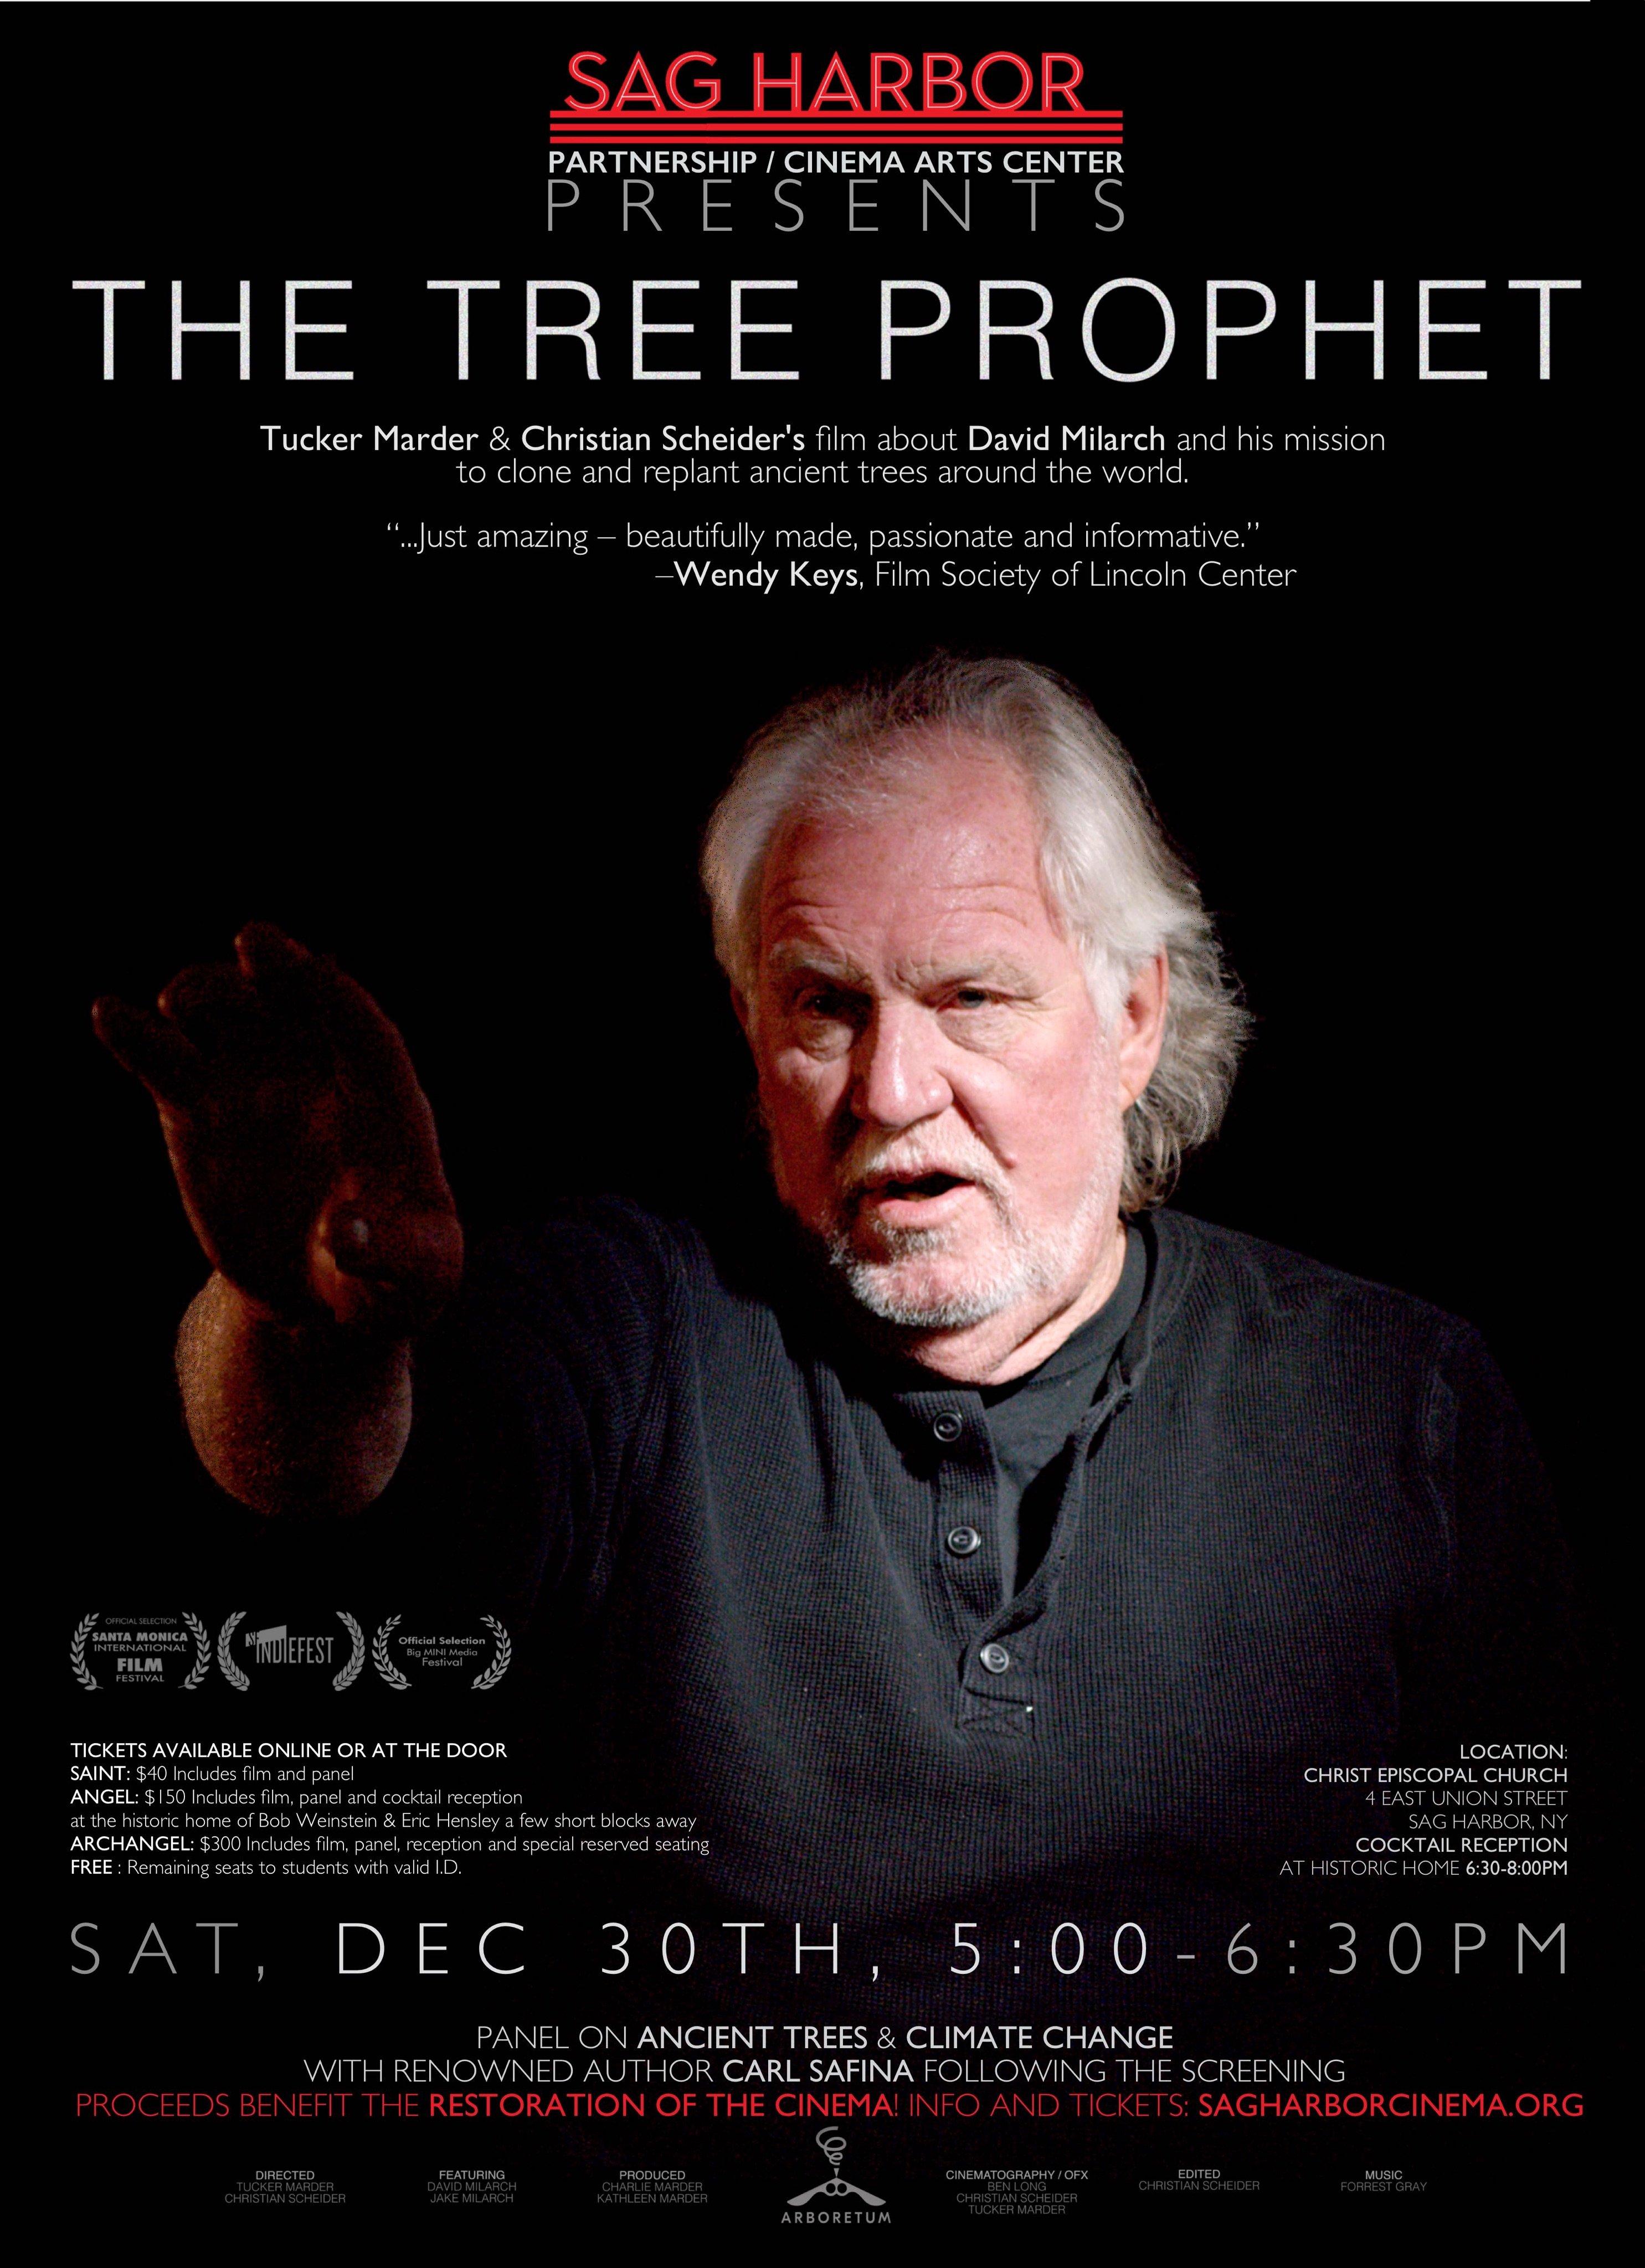 The Tree Prophet Film Premieres   Archangel Ancient Tree Archive